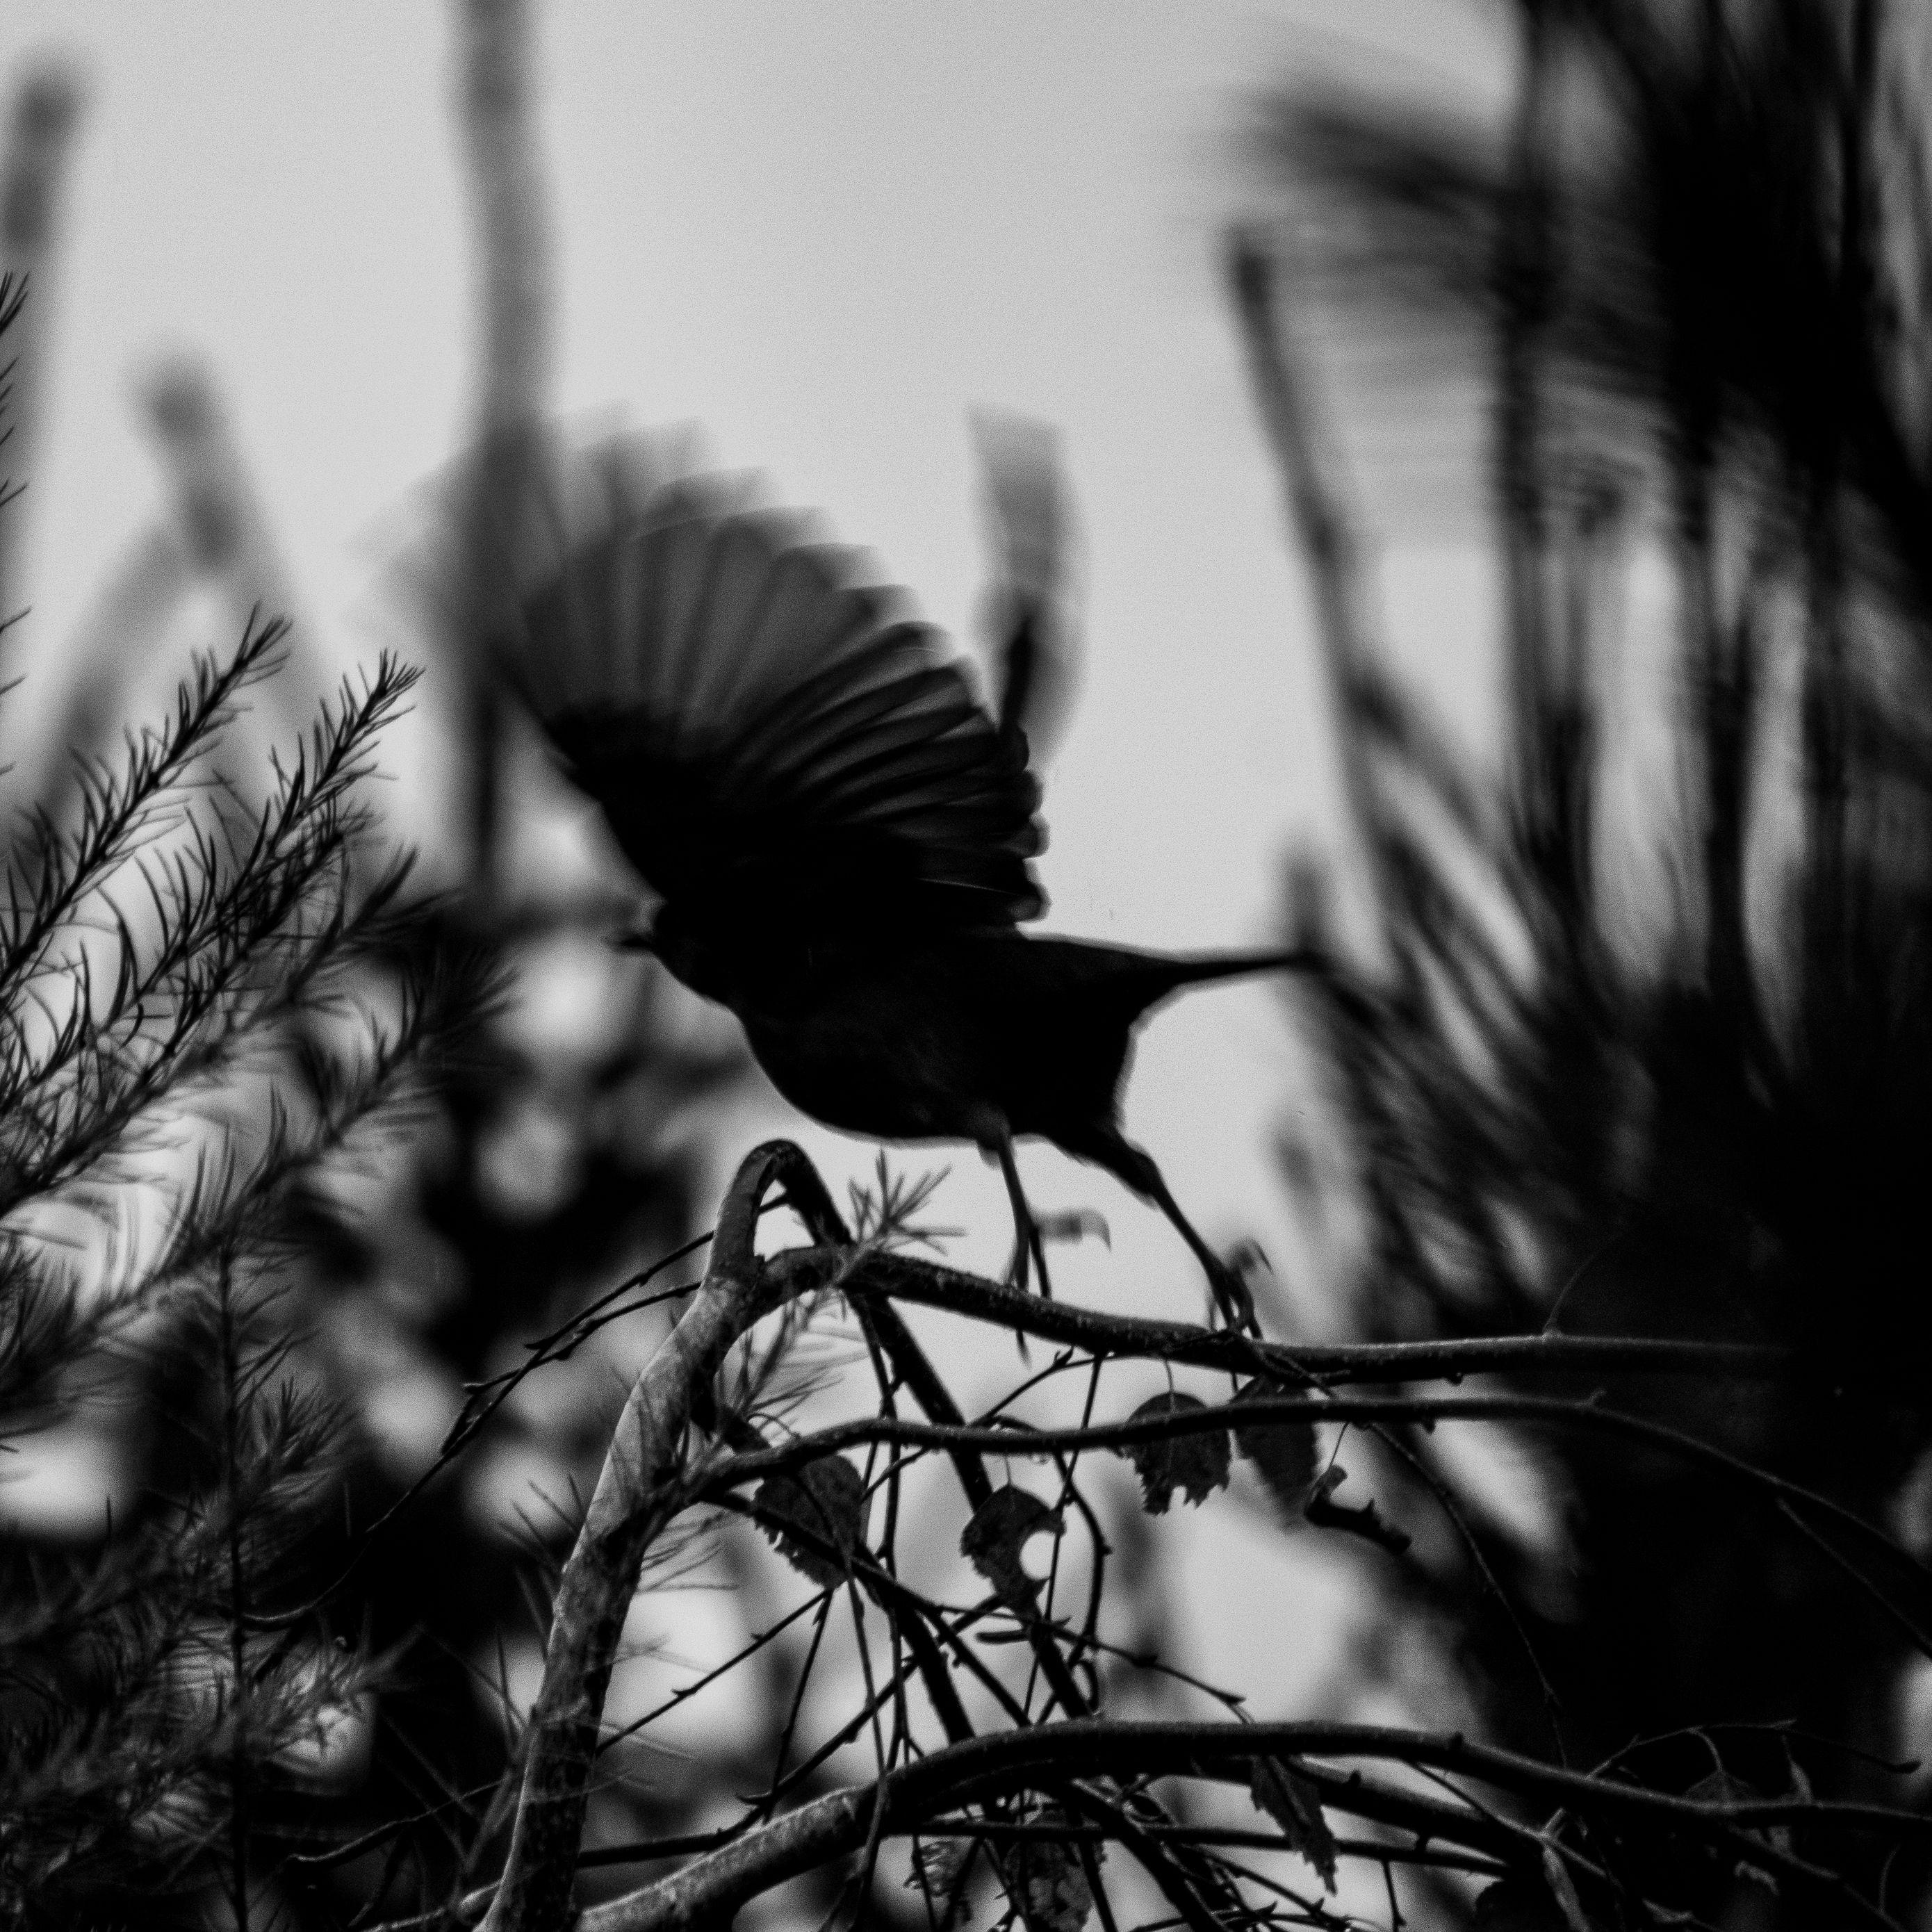 2780x2780 Wallpaper bird, branch, bw, silhouette, dark, flight